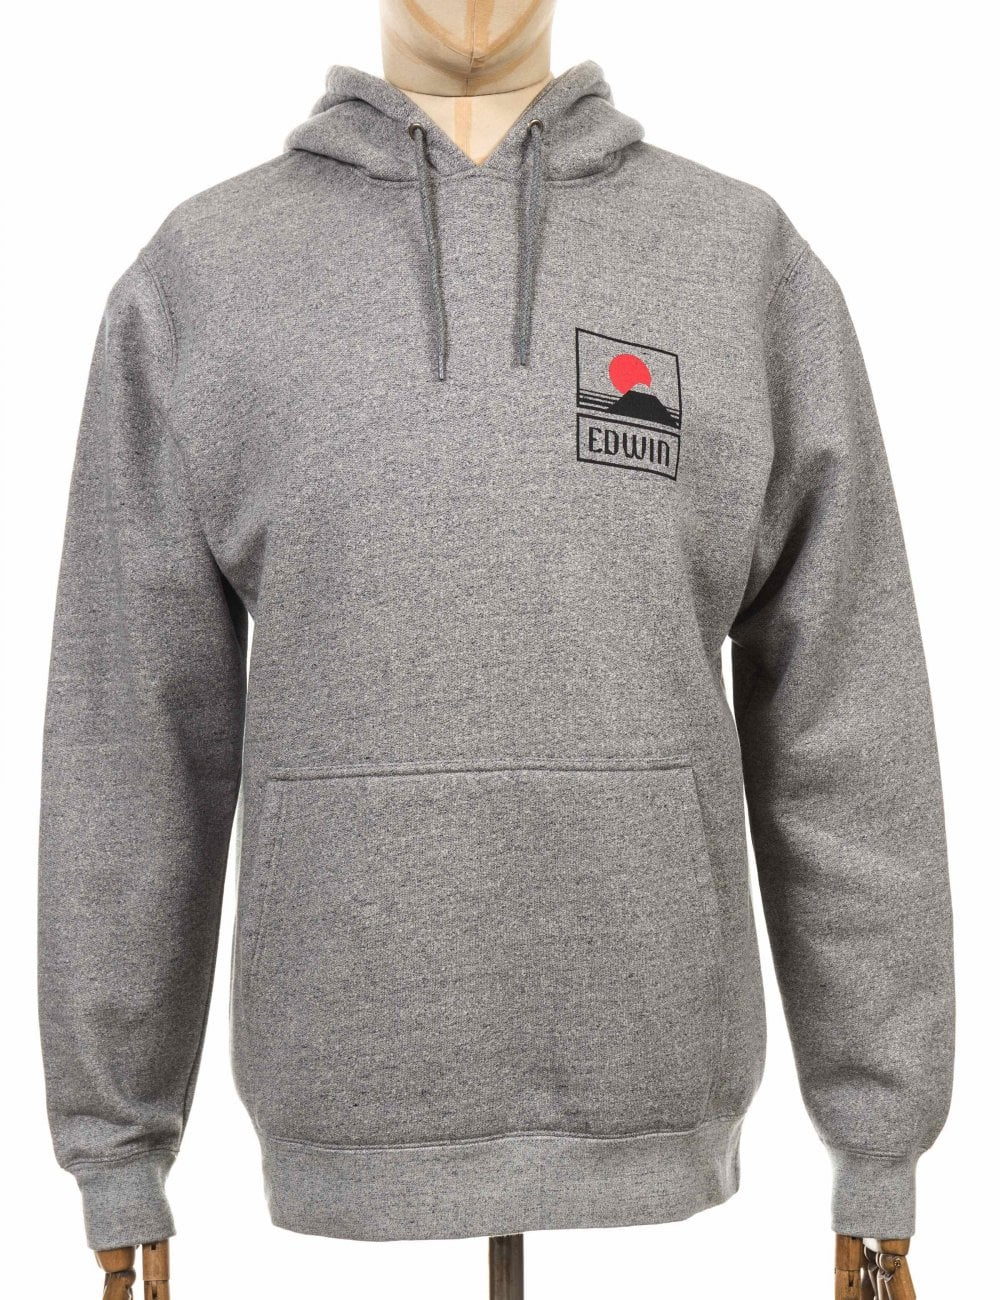 Sunset On Mt Fuji Hooded Sweatshirt Grey Heather